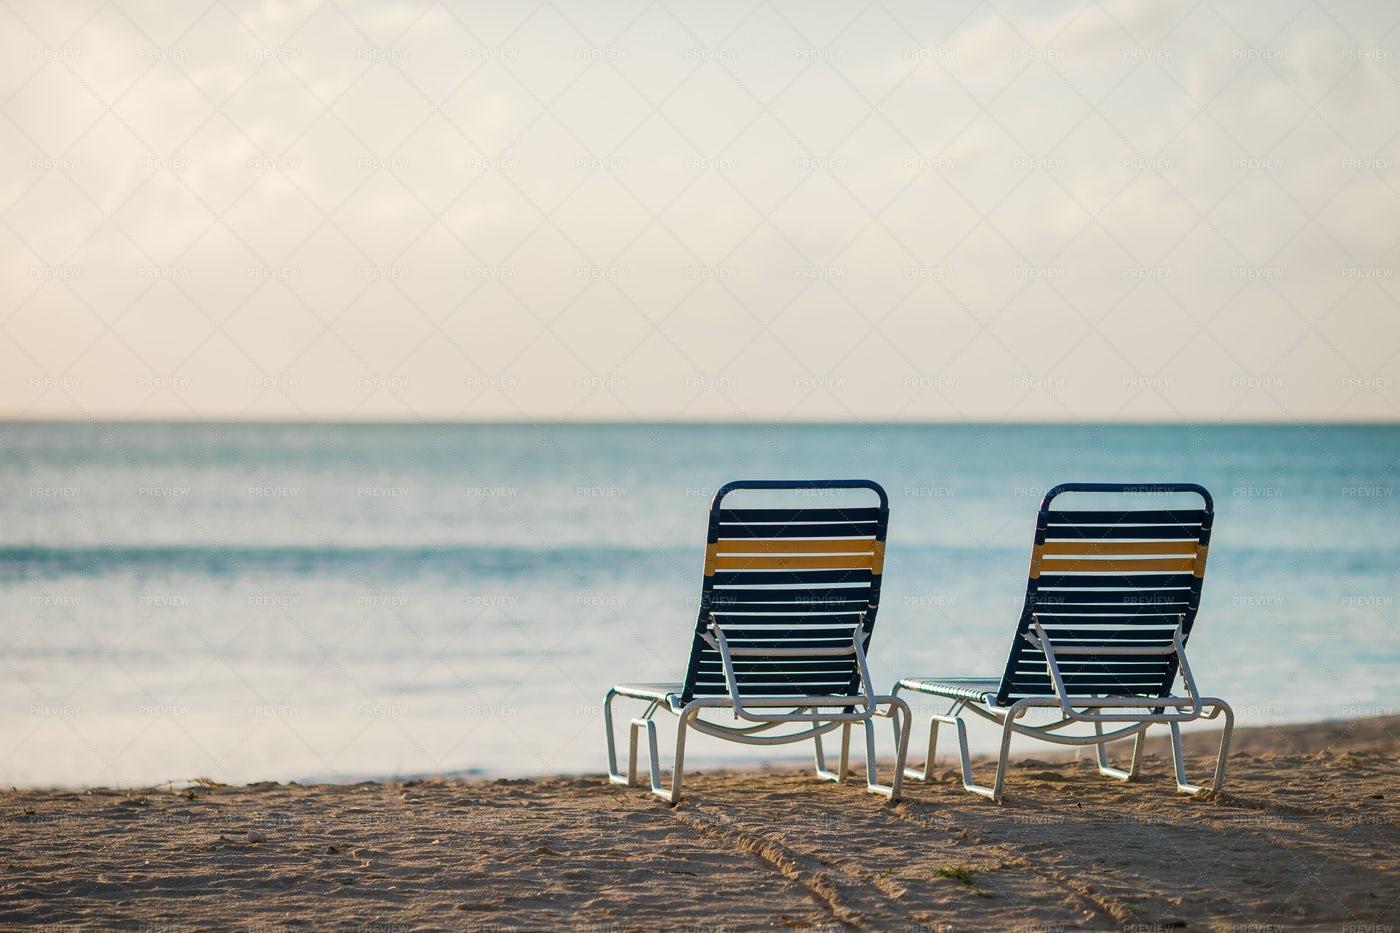 Lounge Chairs On Sandy Beach: Stock Photos